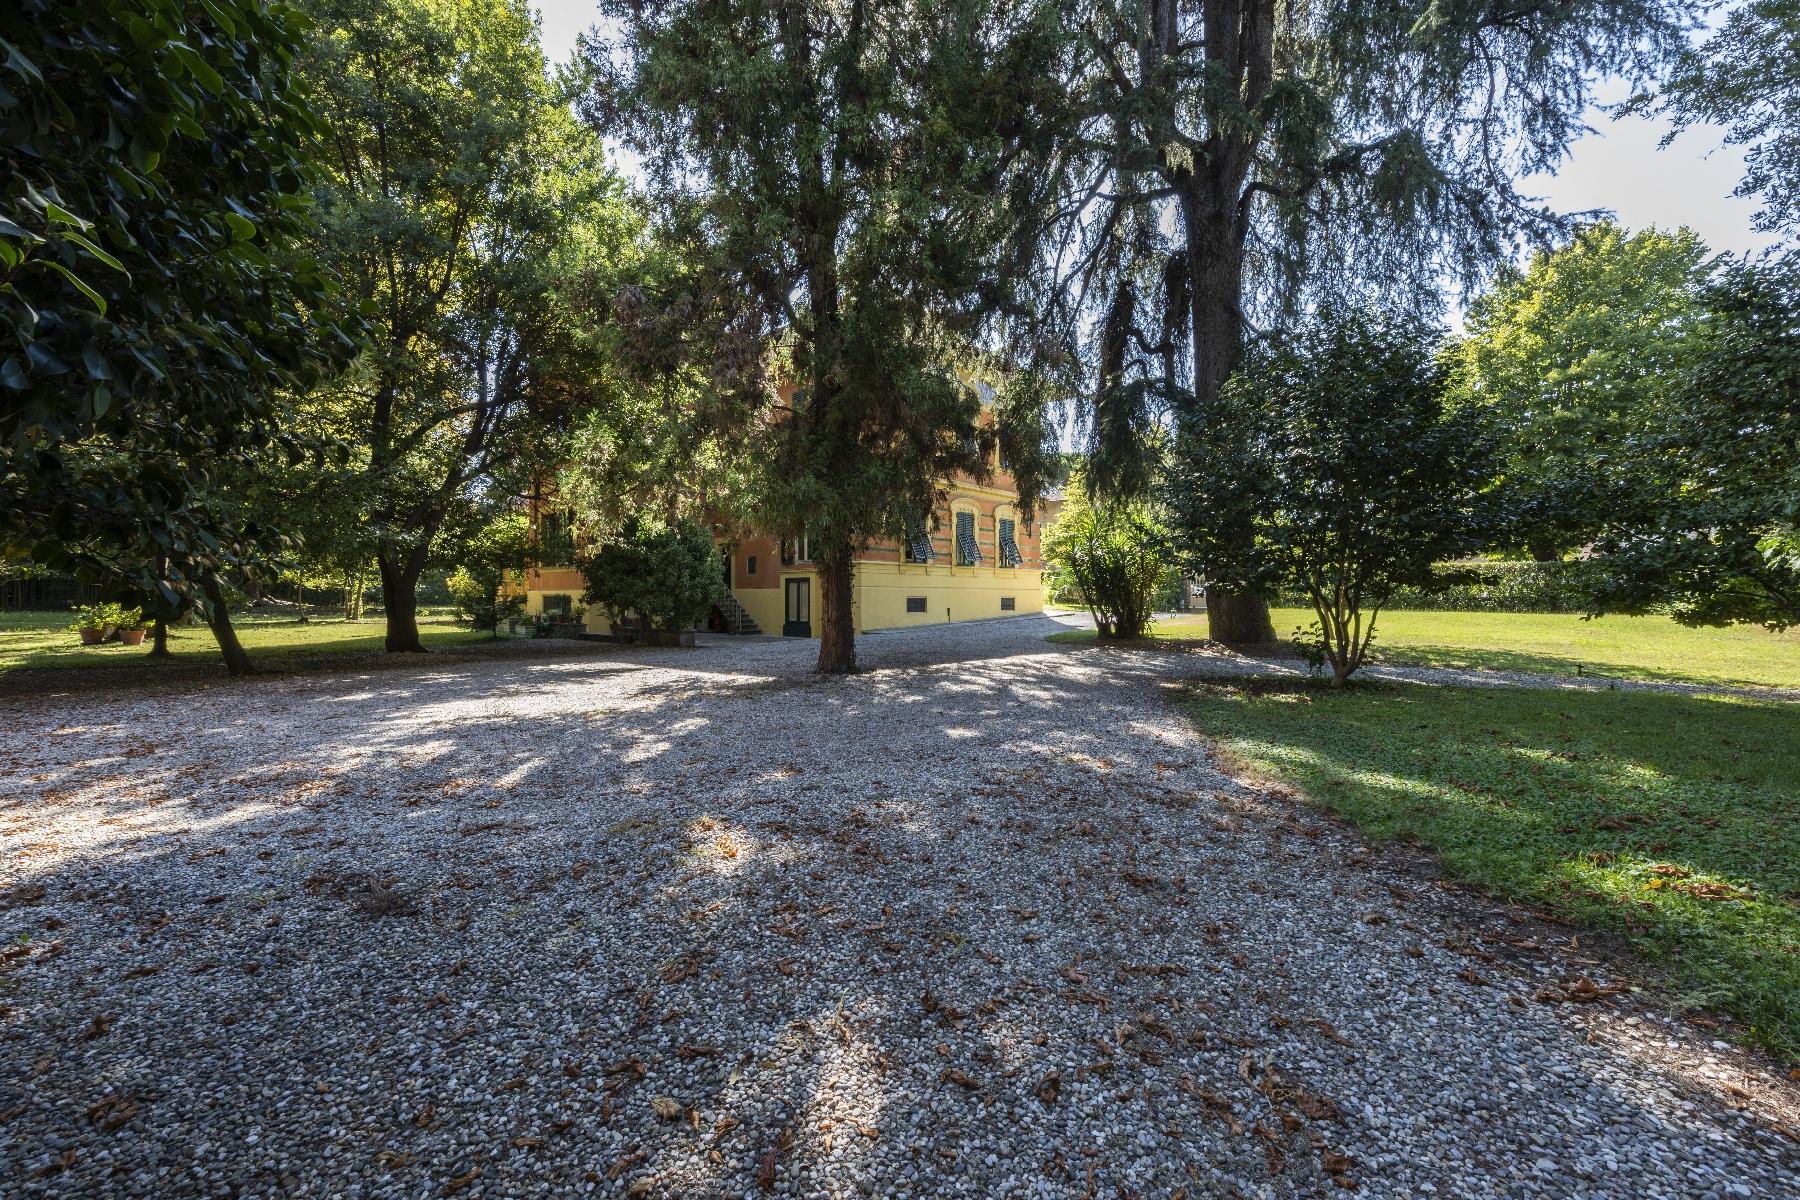 Villa in Vendita a Lucca: 5 locali, 660 mq - Foto 30